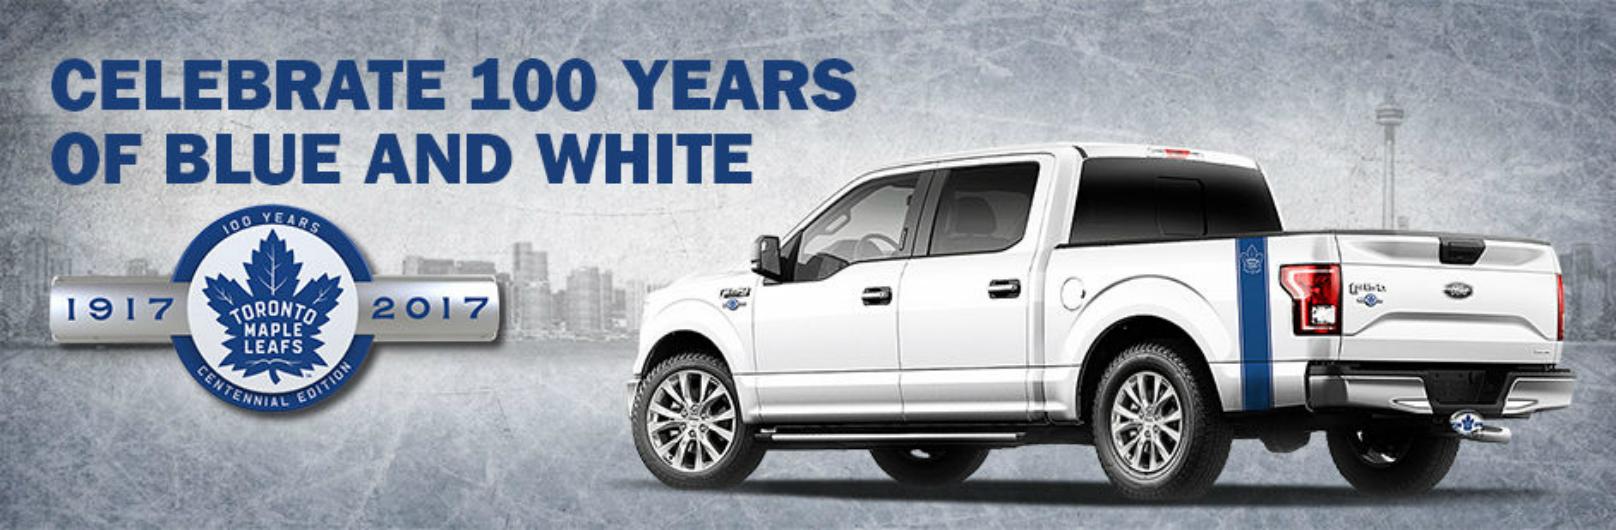 Toronto Maple Leafs Centennial Edition F-150